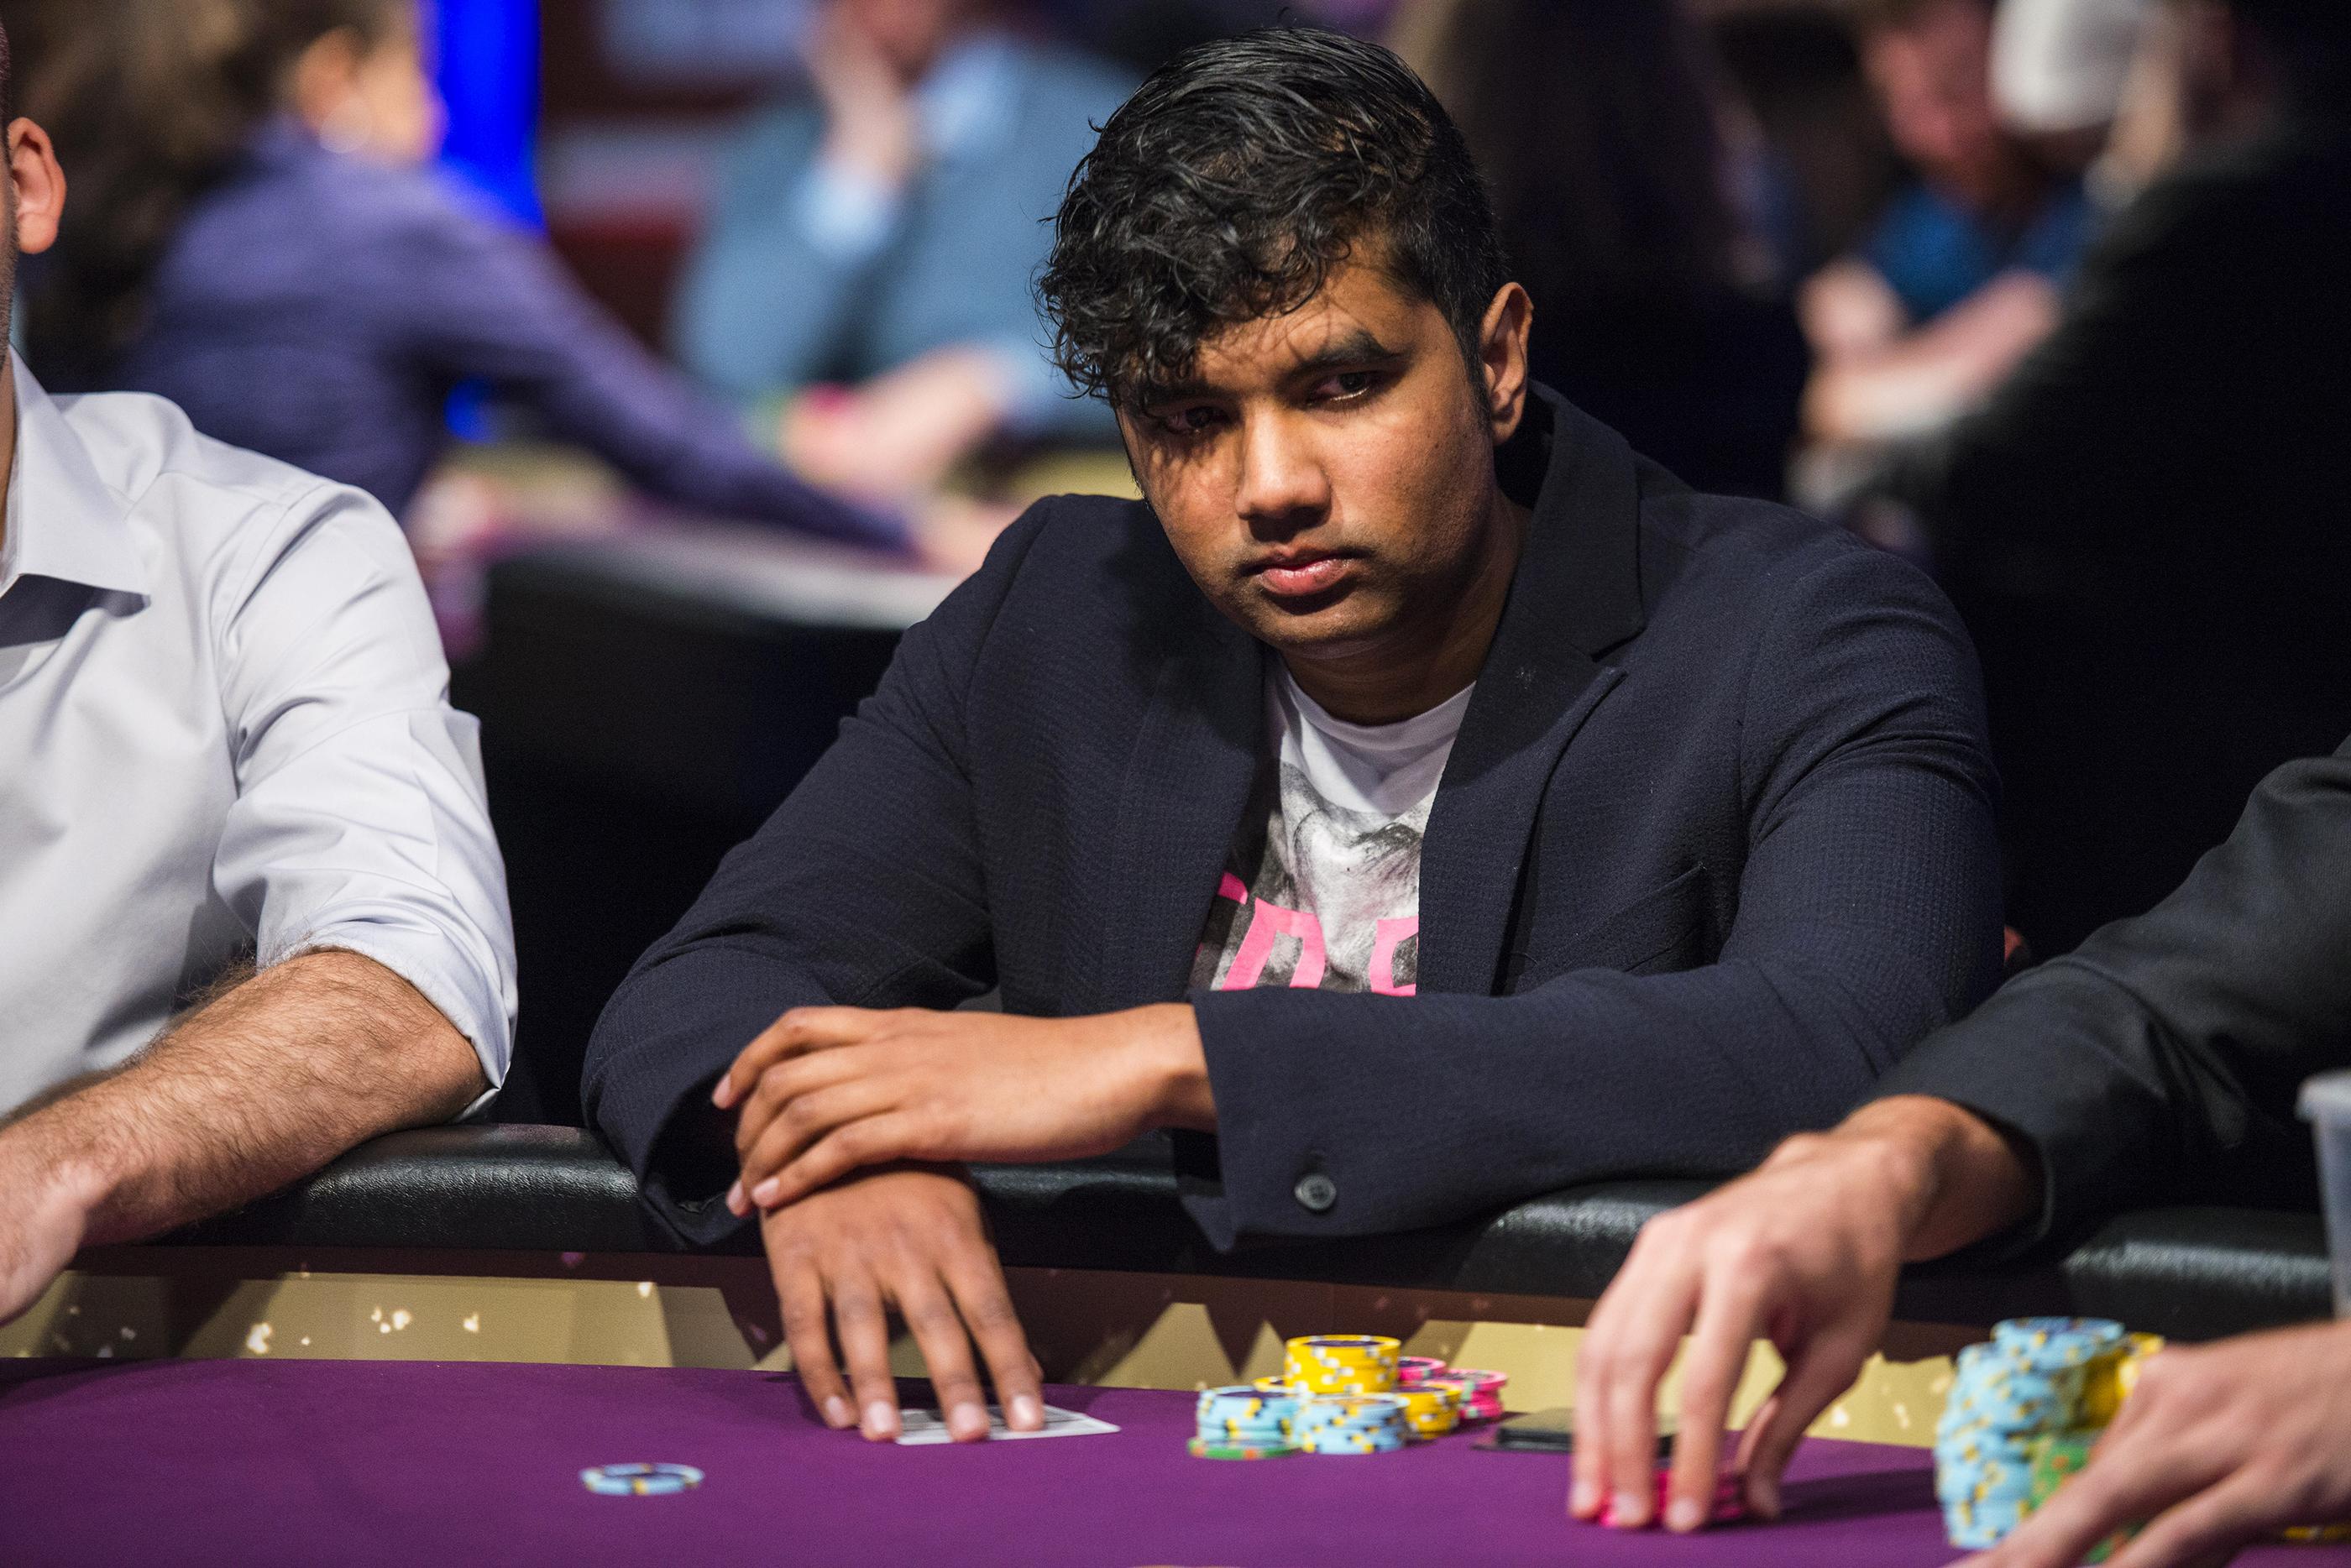 180525-pratyush-buddiga-poker-champ